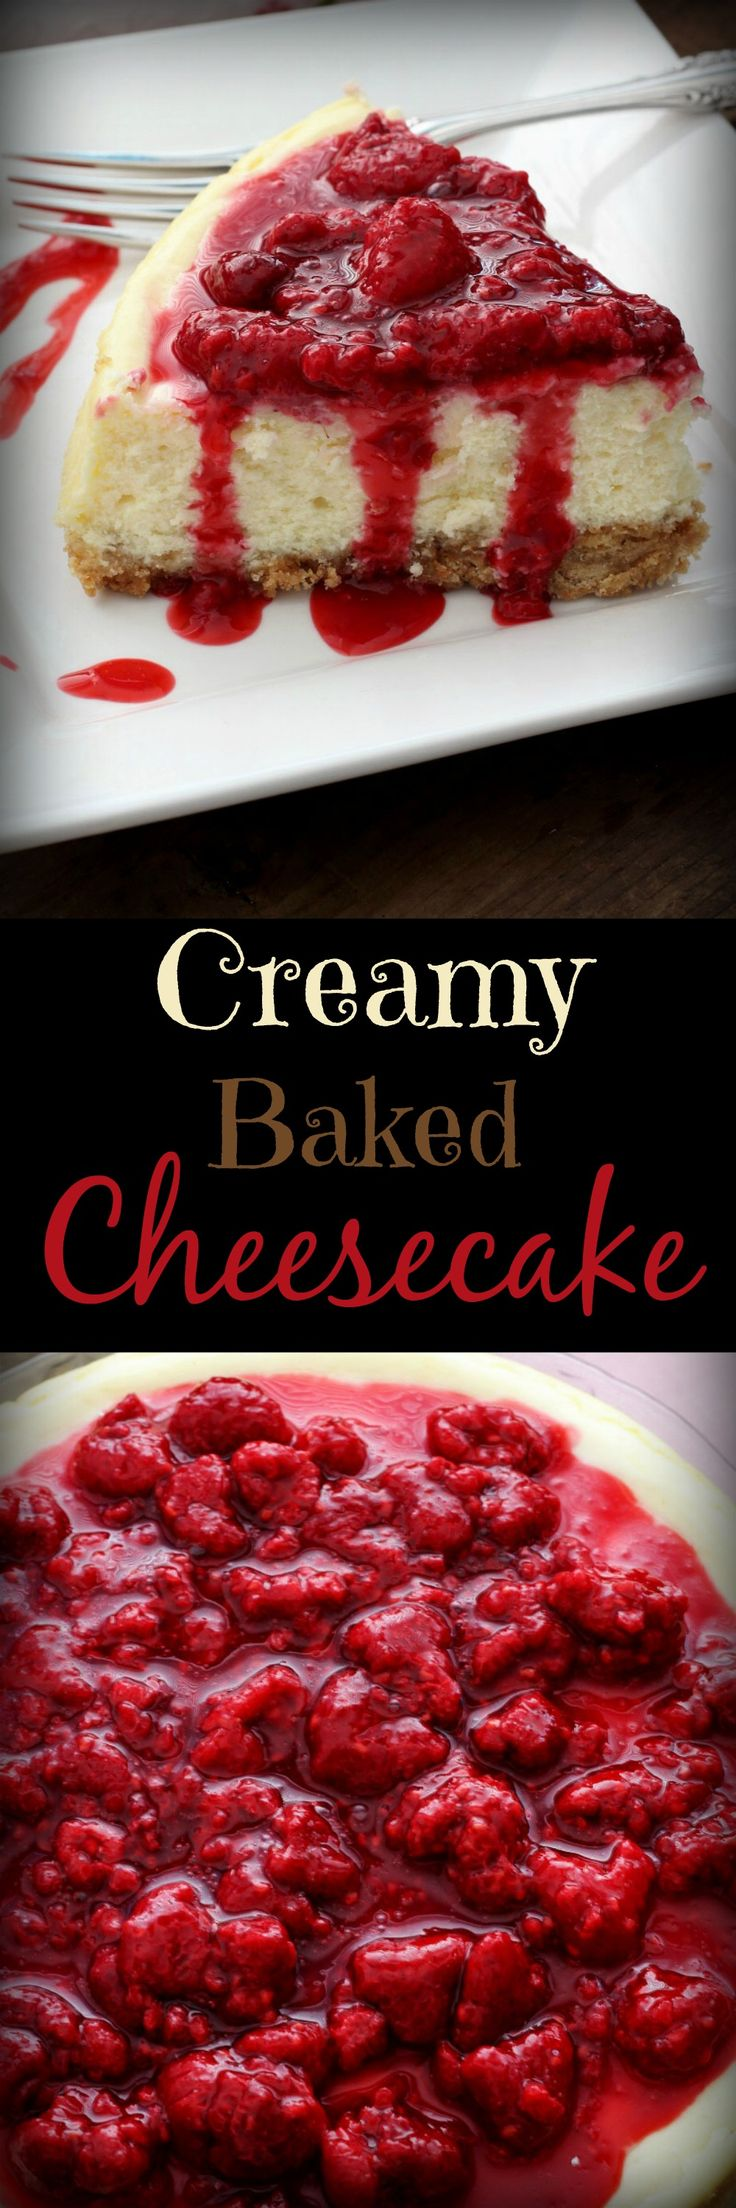 Creamy Baked Cheesecake, Recipe Treasures